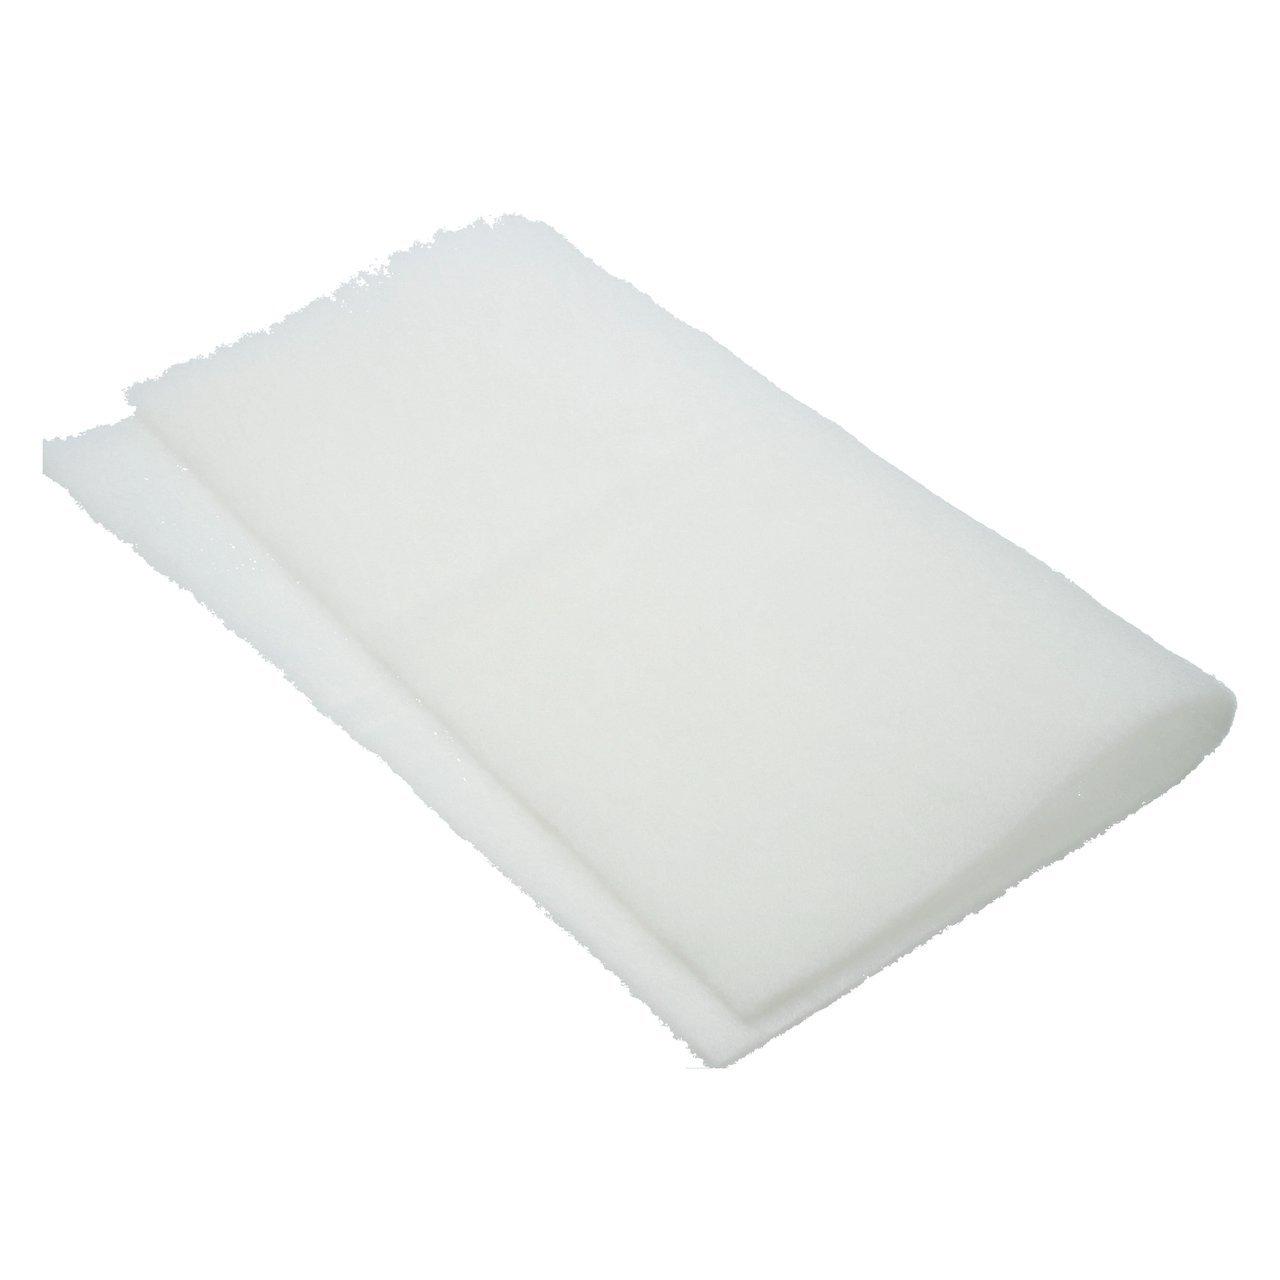 Filtermatte, fett Filter ✧WESSPER® Filter für Dunstabzugshaube Bauknecht DC5355WS